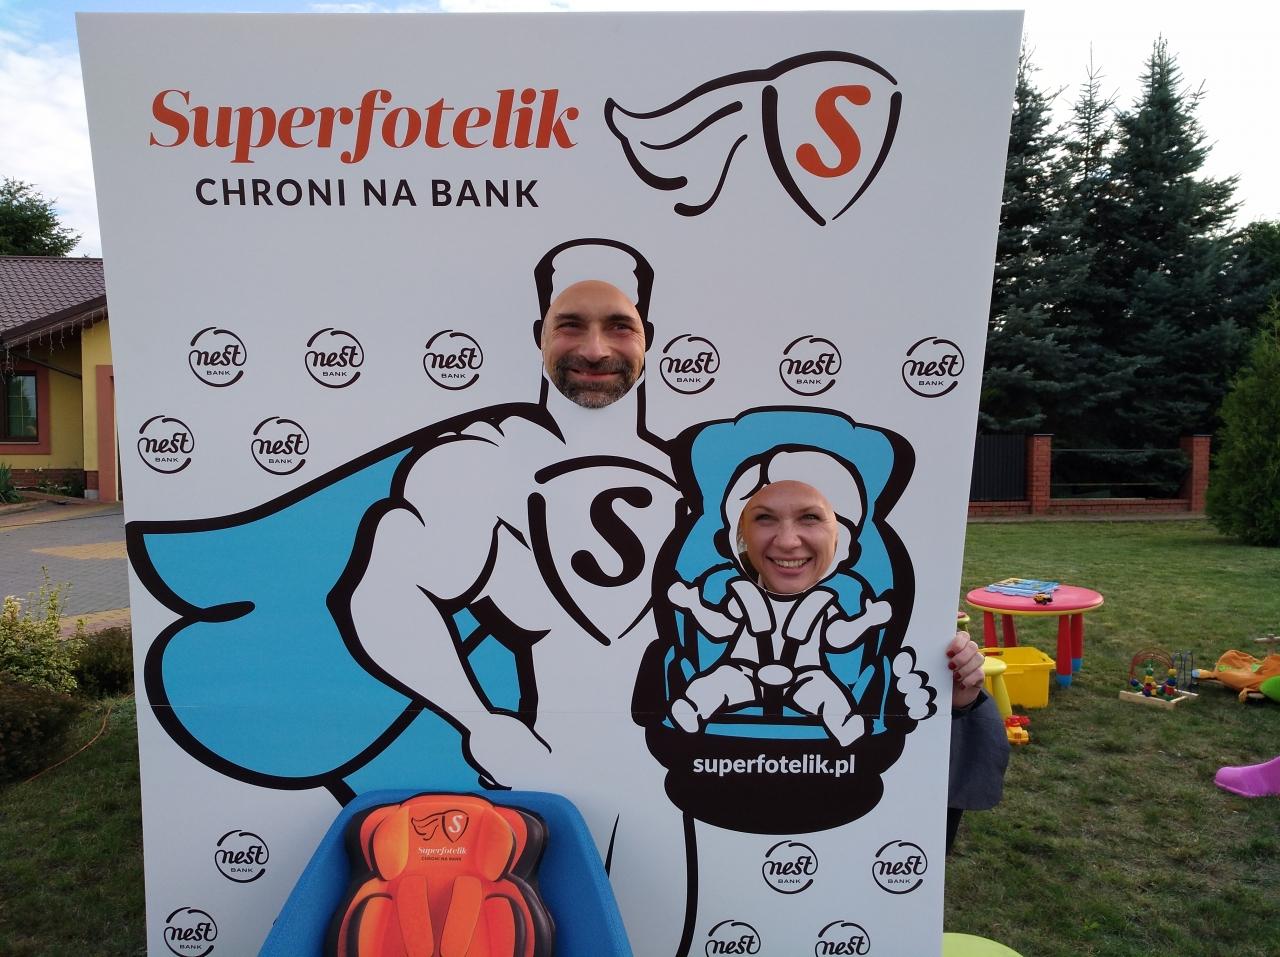 Superfotelik CHRONI NA BANK